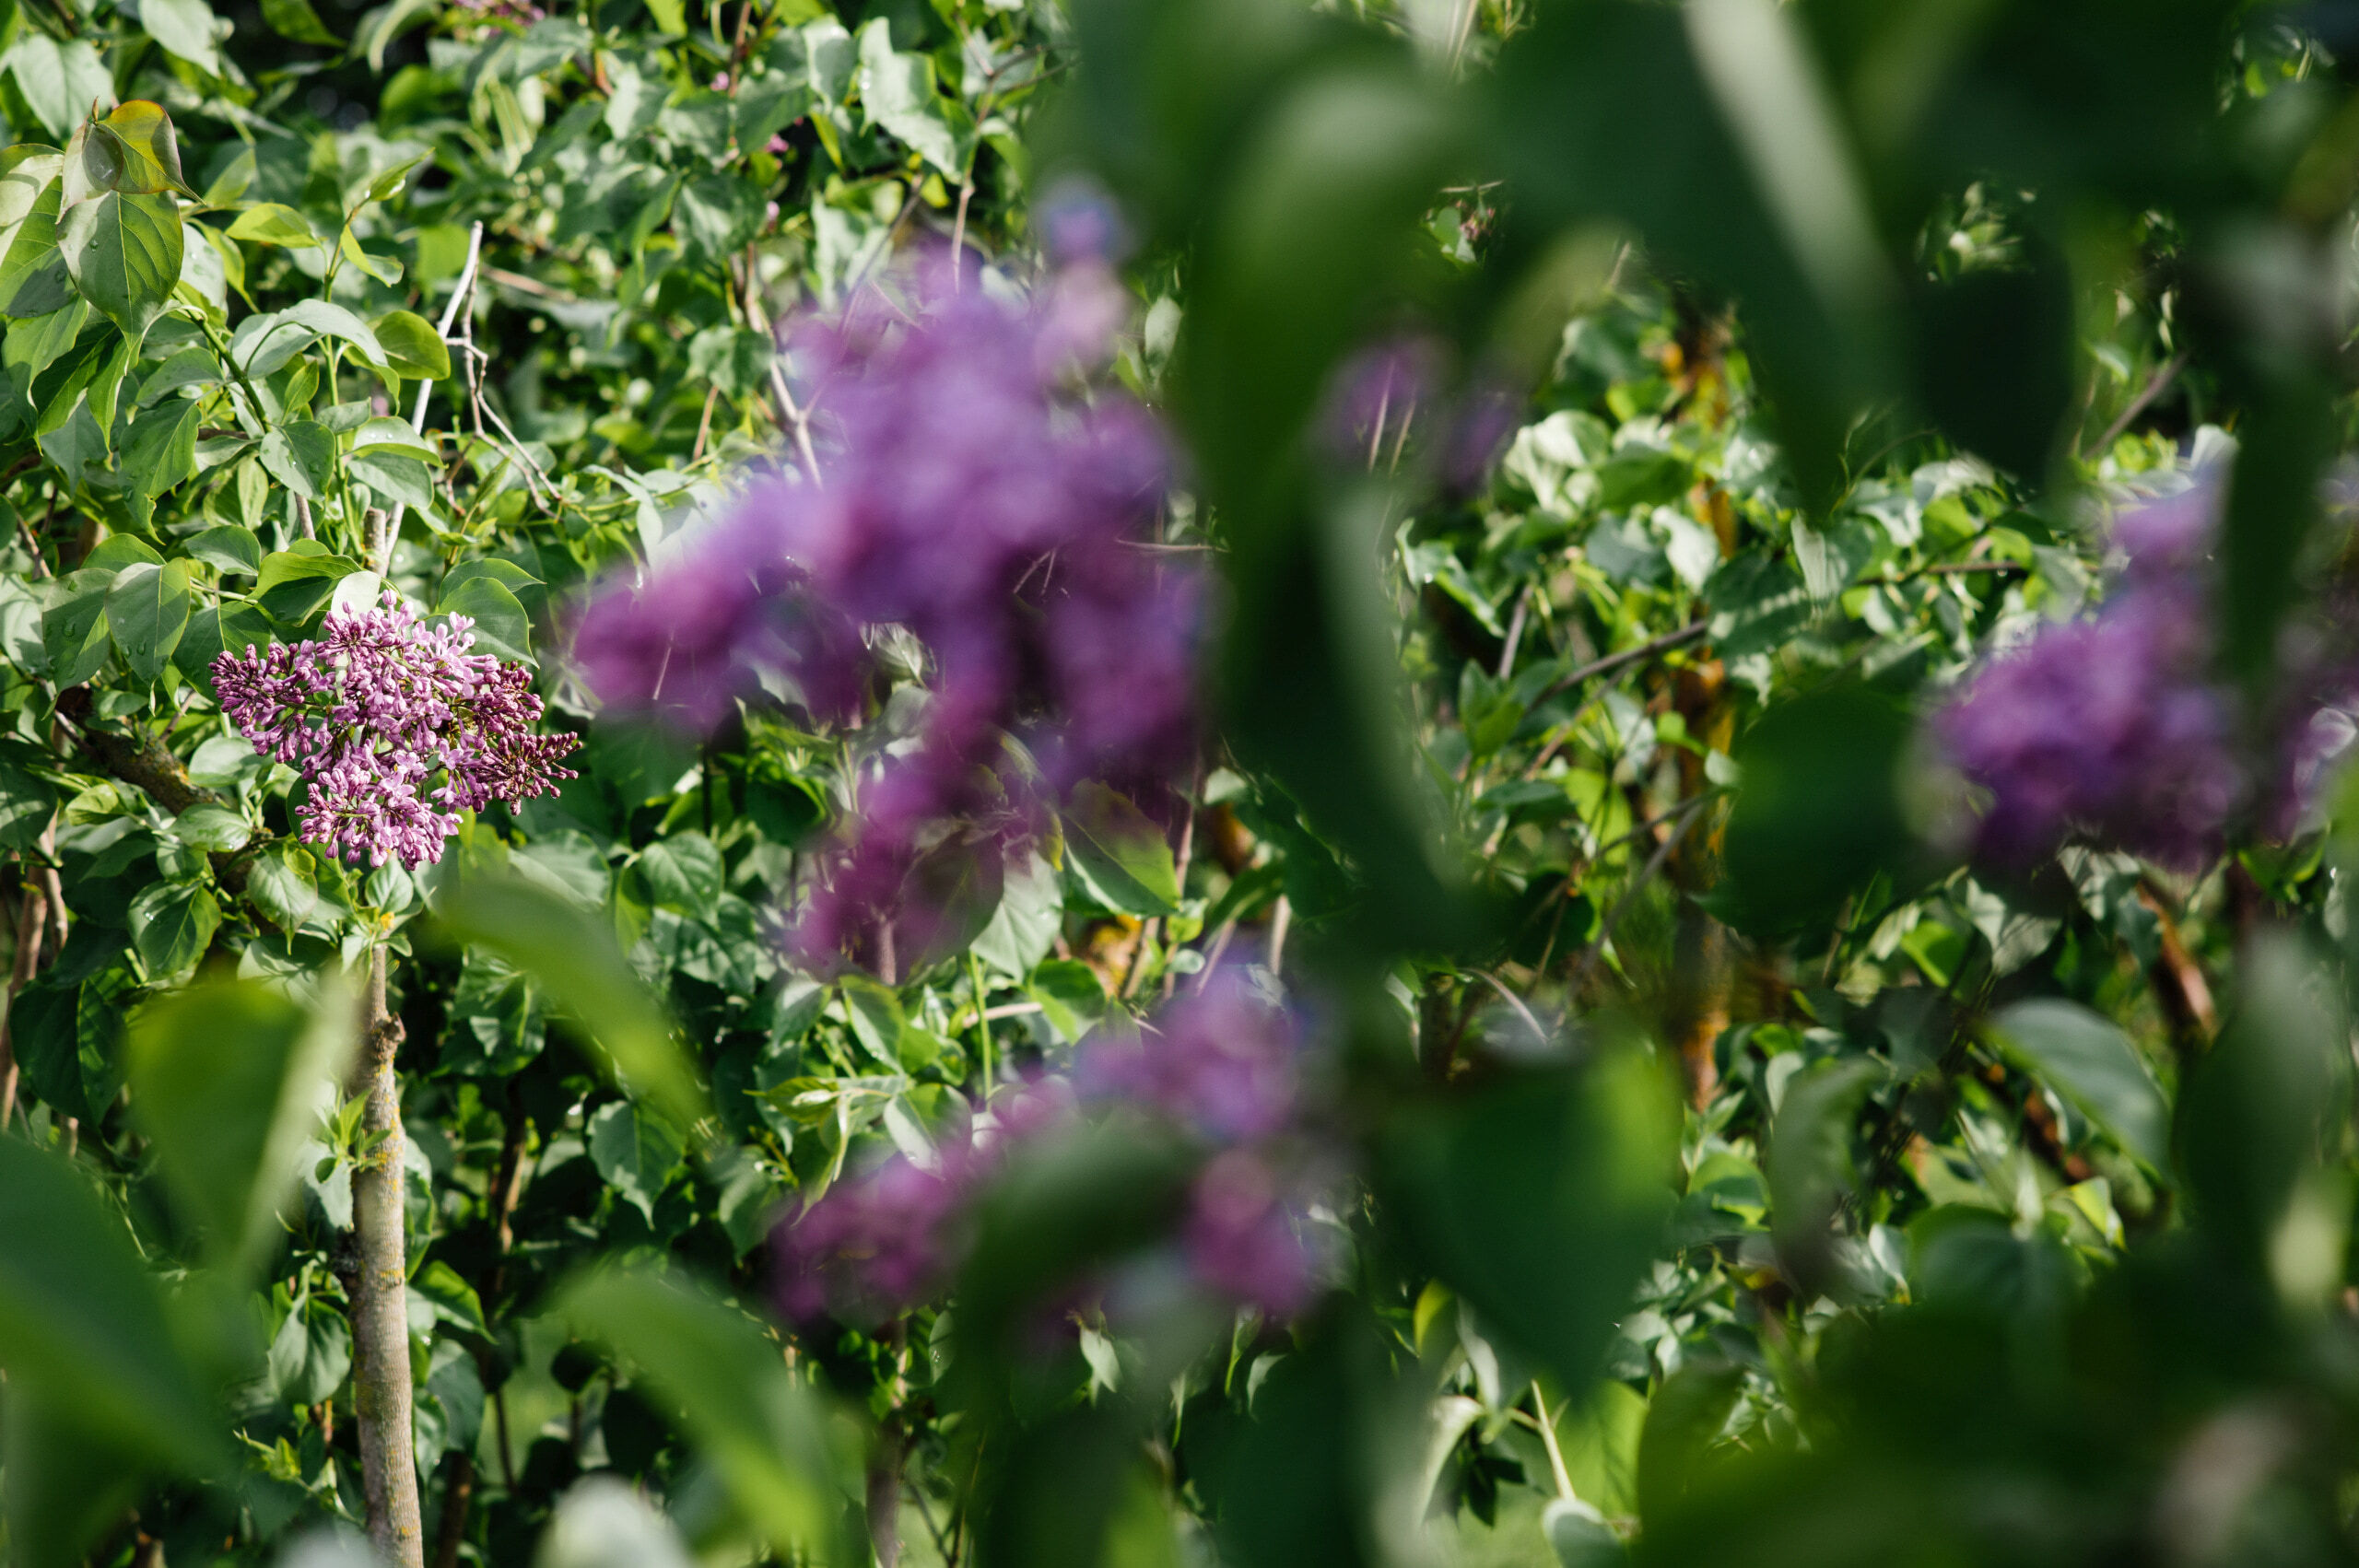 Vakaras botanikos sode - Vilmantas Ramonas